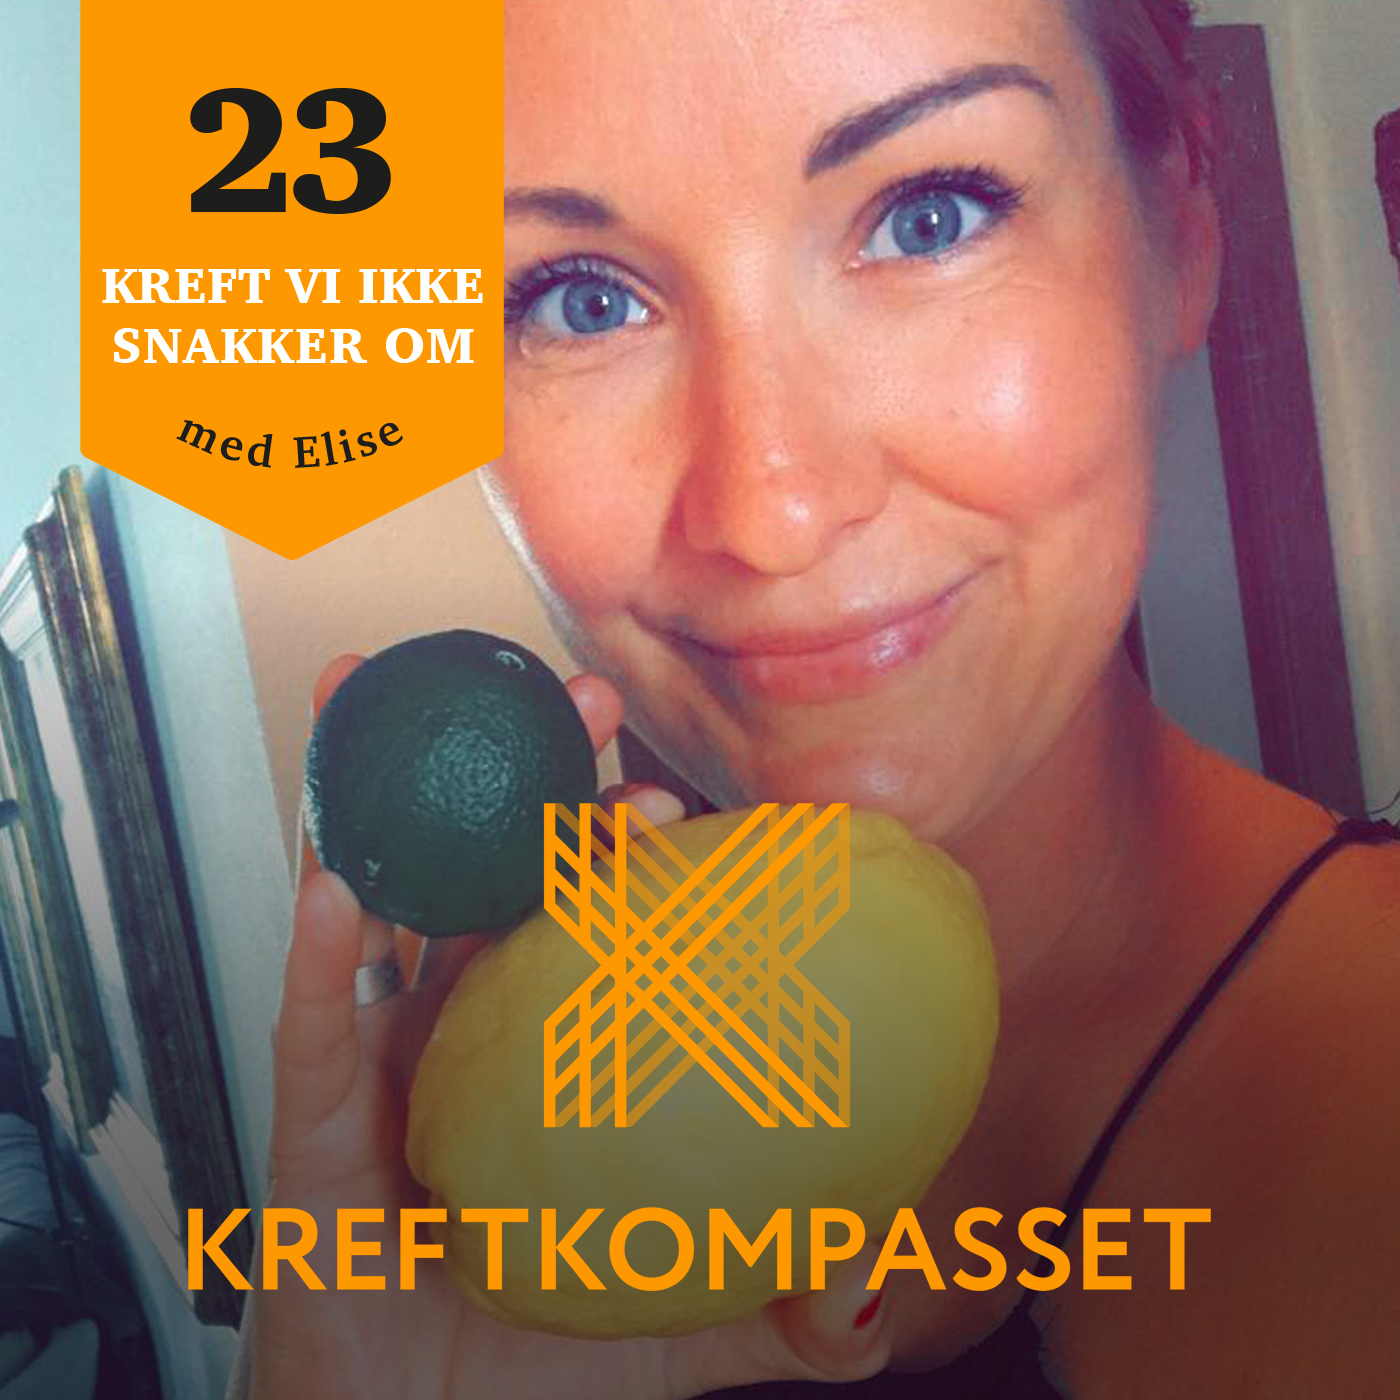 Episode 23 Kreftkompasset_Elise_1400.jpg